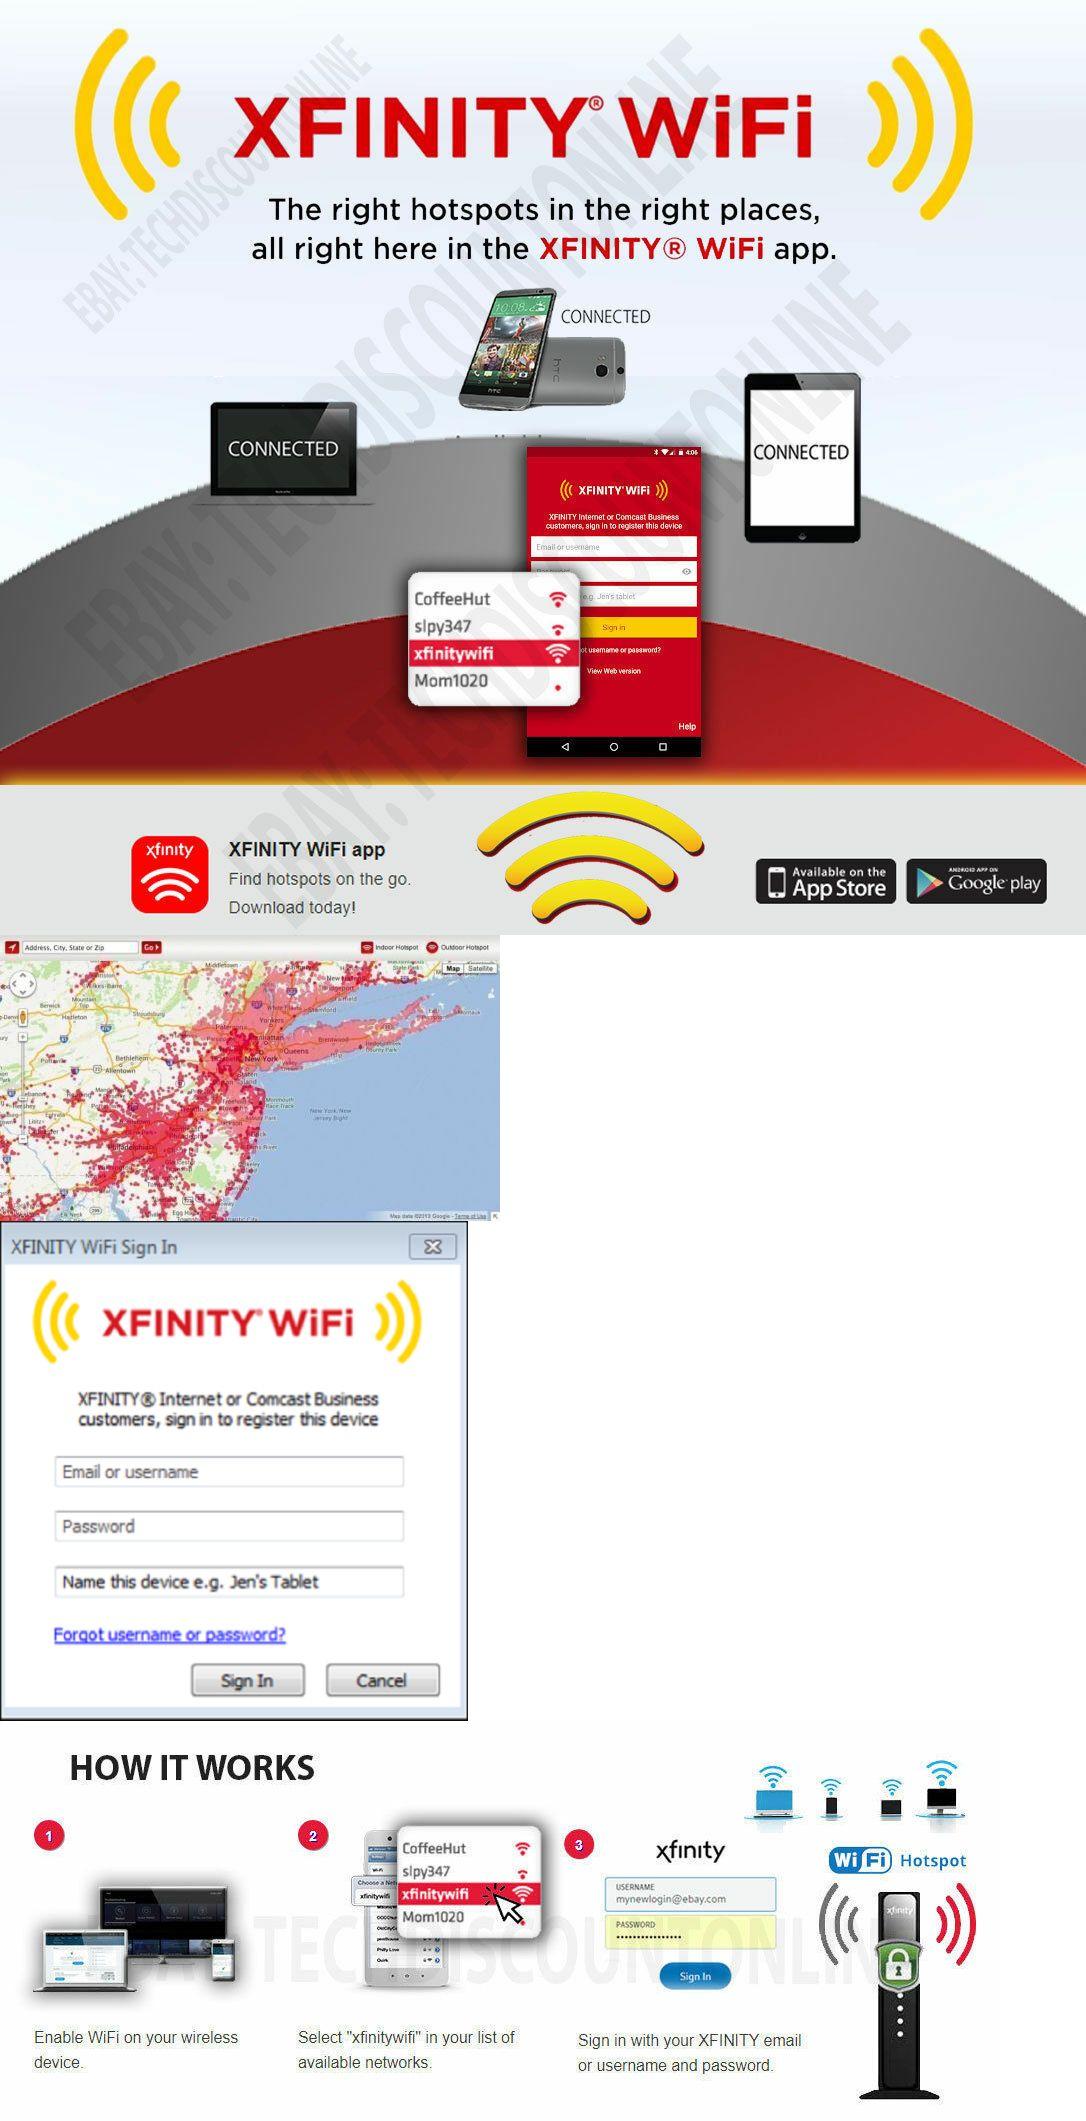 Wireless Routers 44995 Xfinity Wifi Hotspot Internet Access 1